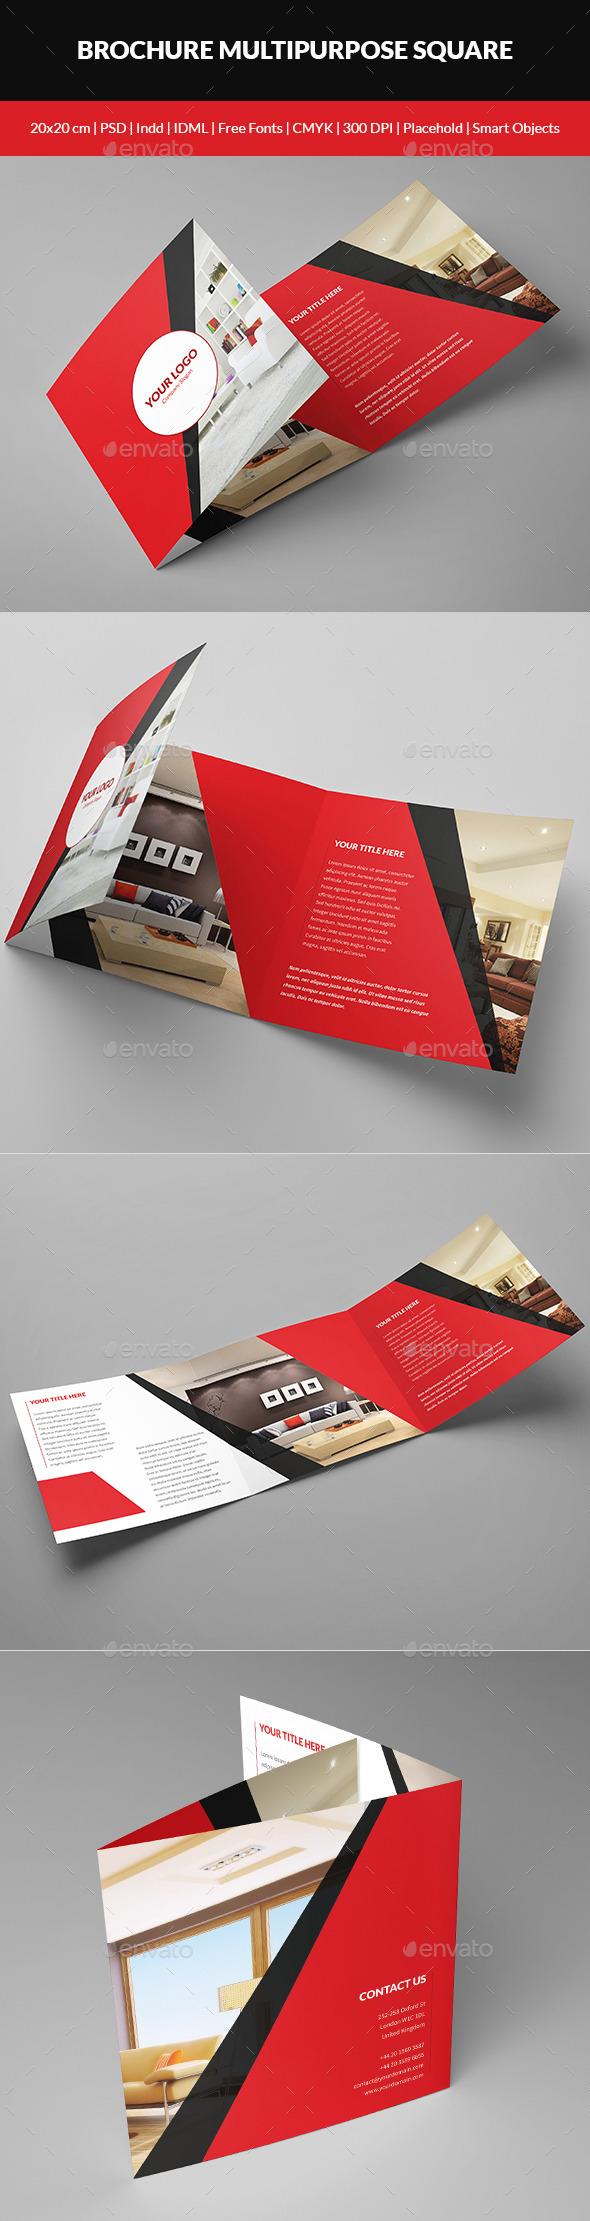 Brochure Multipurpose Square - Brochures Print Templates